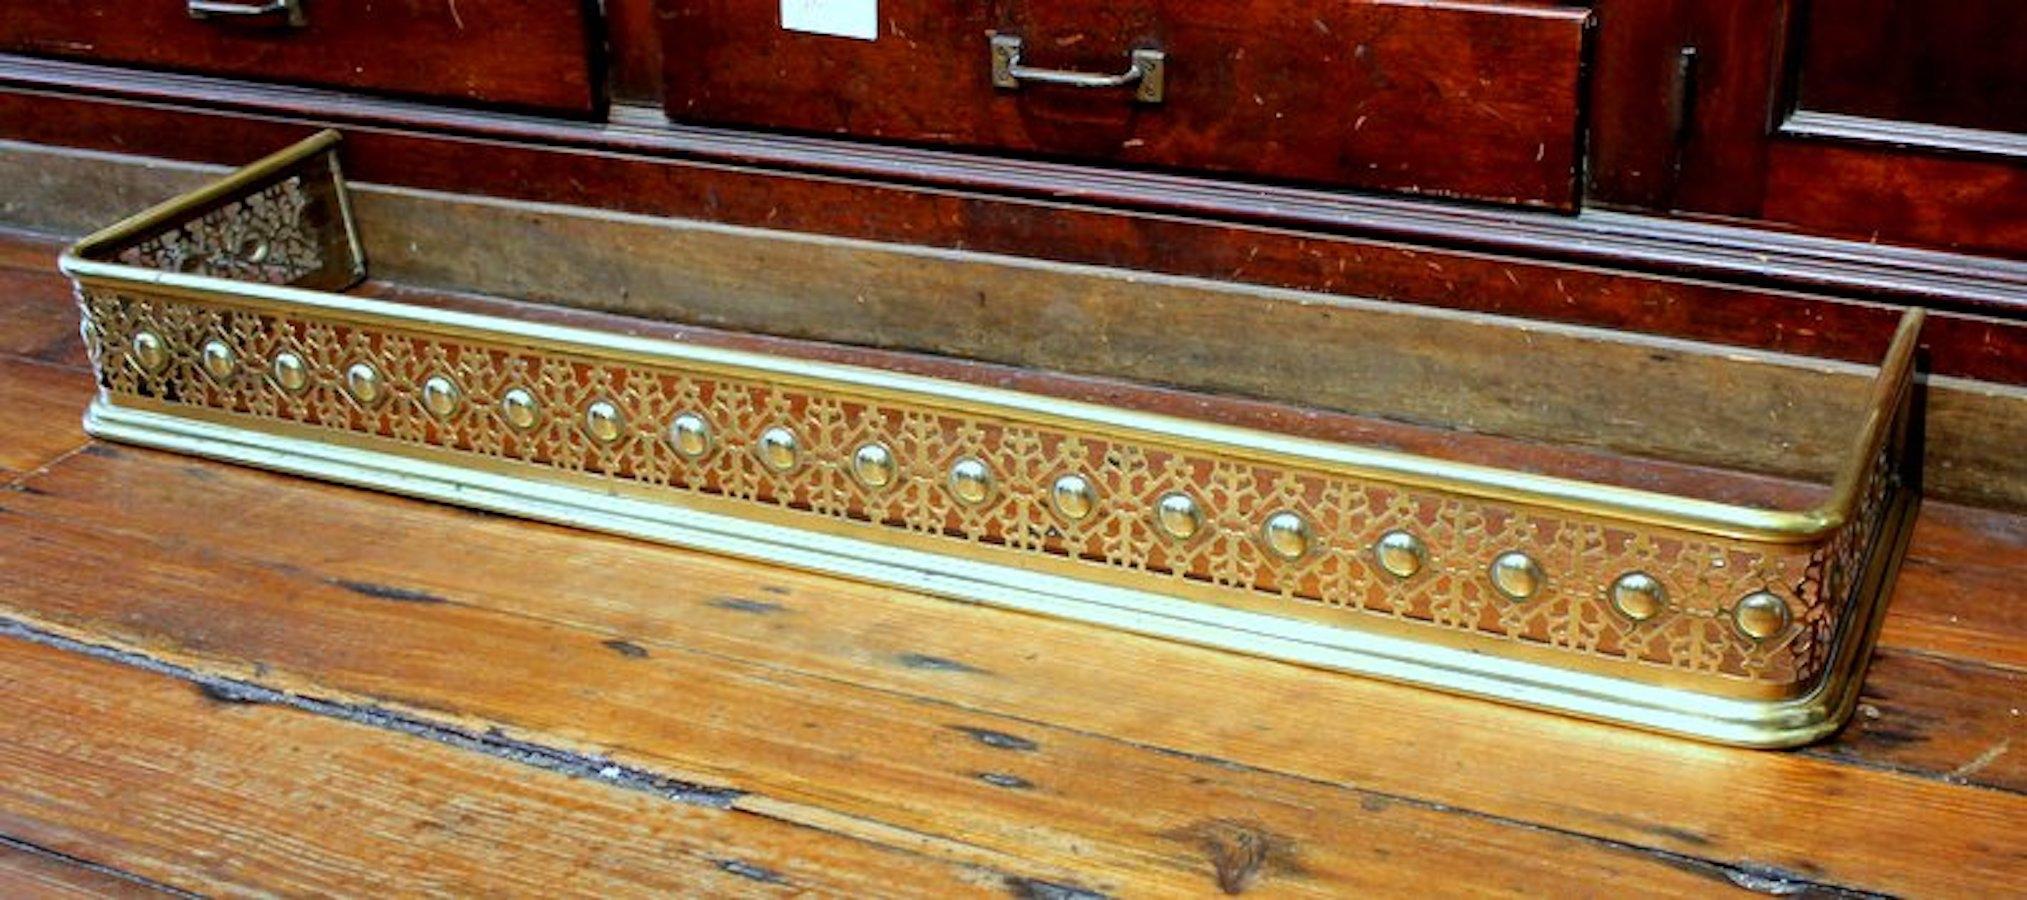 Antique English Pierced Brass Fireplace Fender George C Birlant